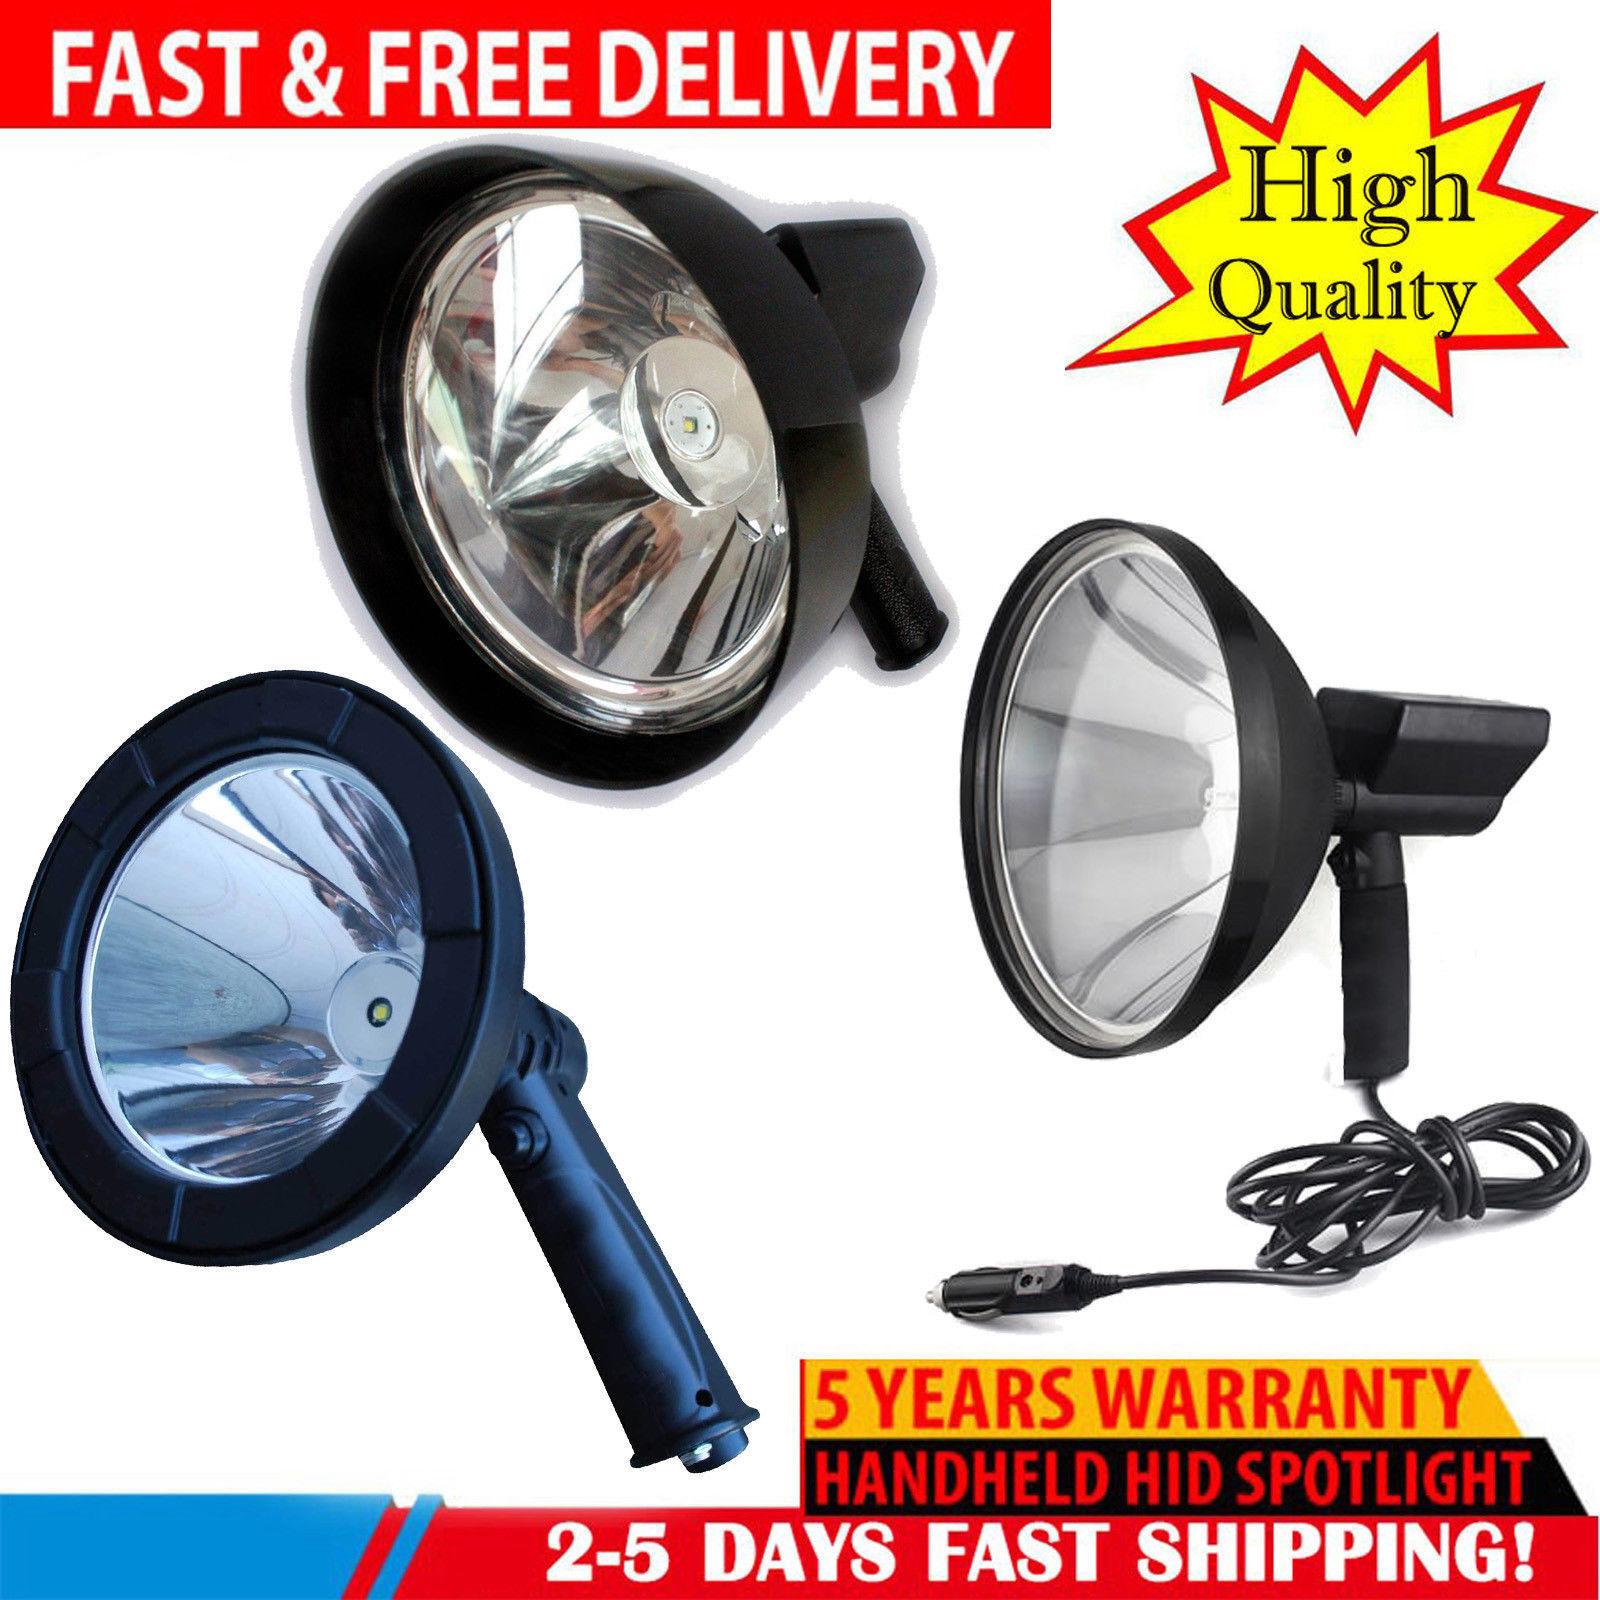 Rechargeable spotlight searchlight handheld portable led Waterproof flashlight